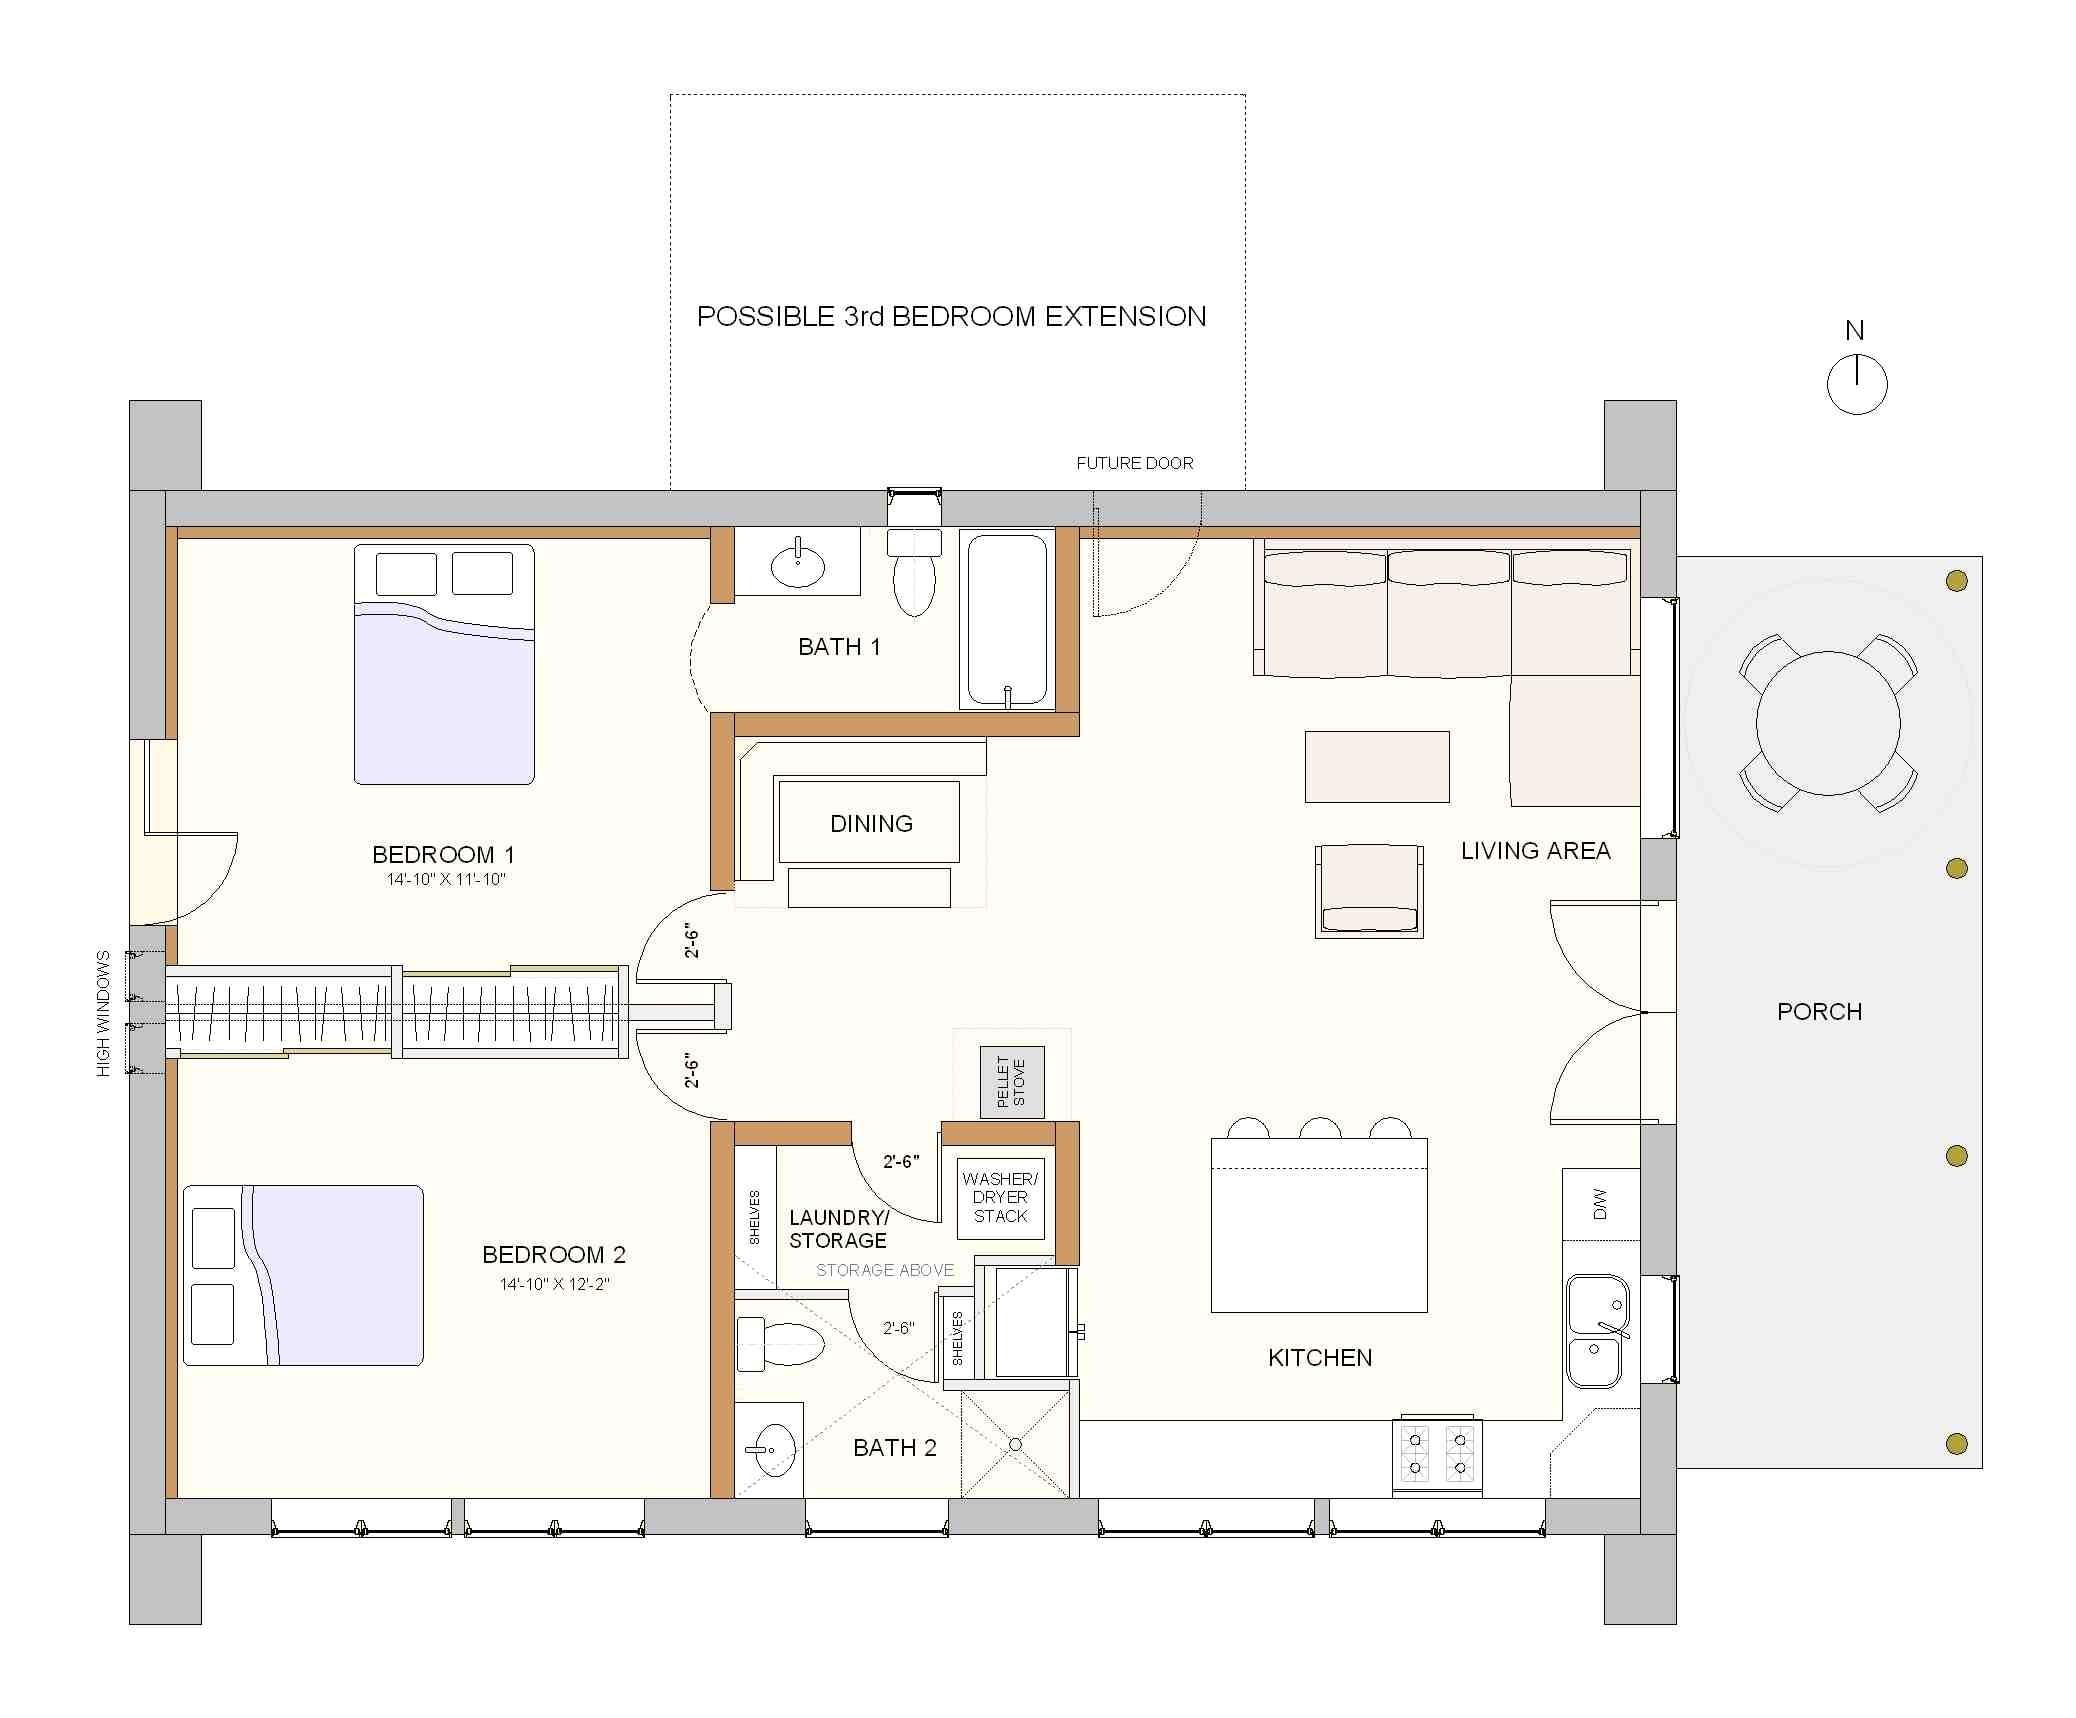 space saving floor plans